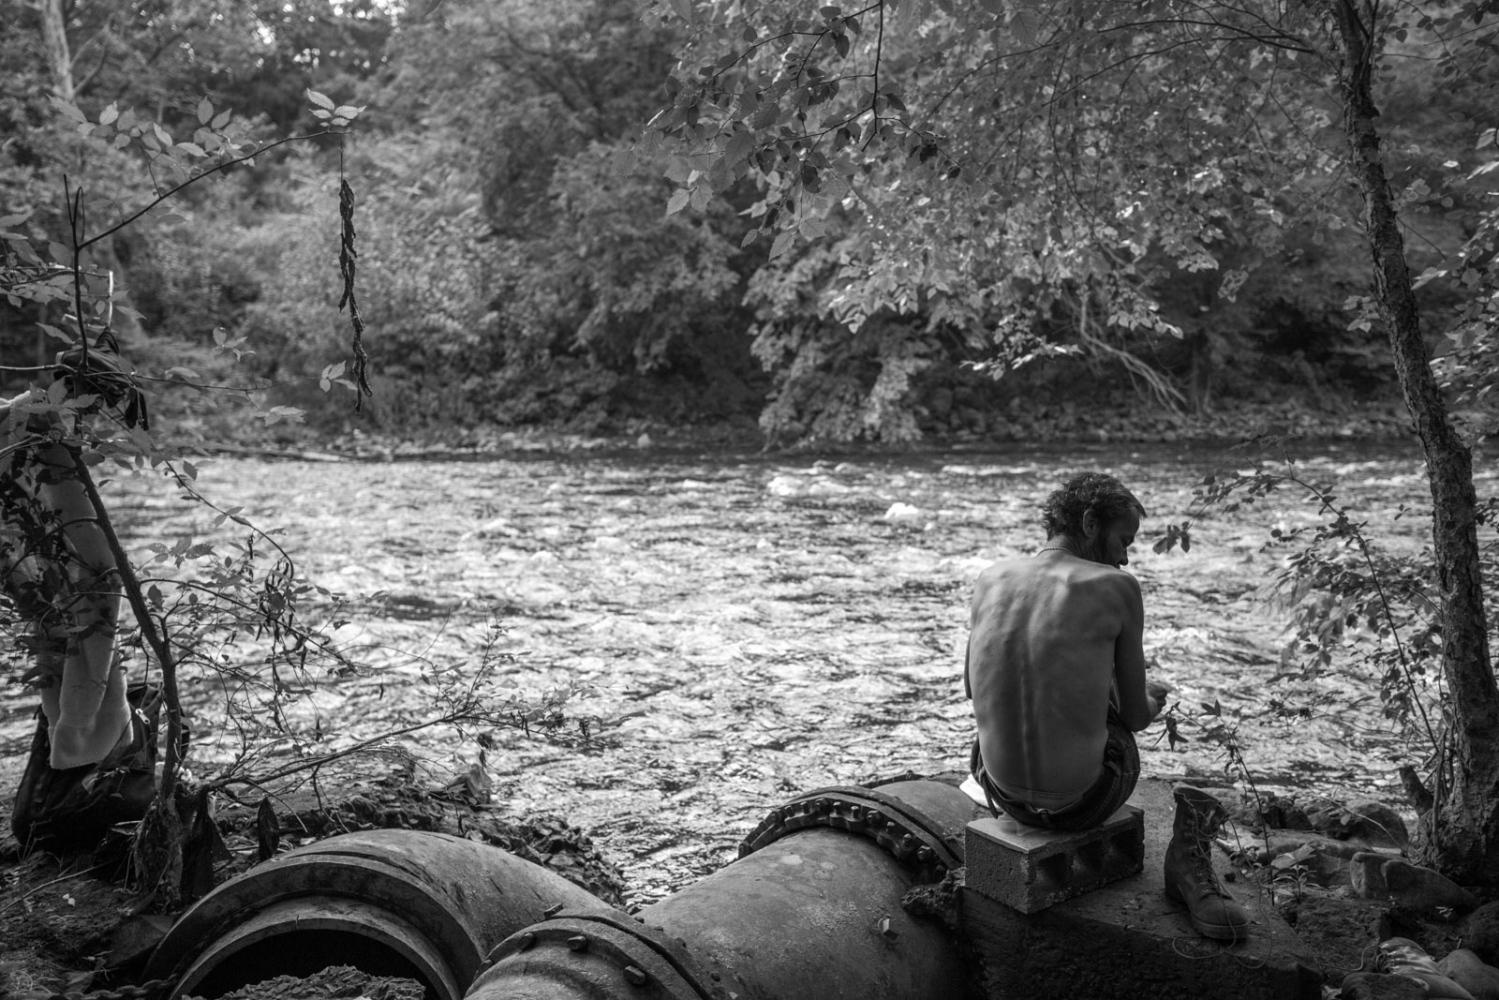 Art and Documentary Photography - Loading 23_HomeoftheBrave.jpg